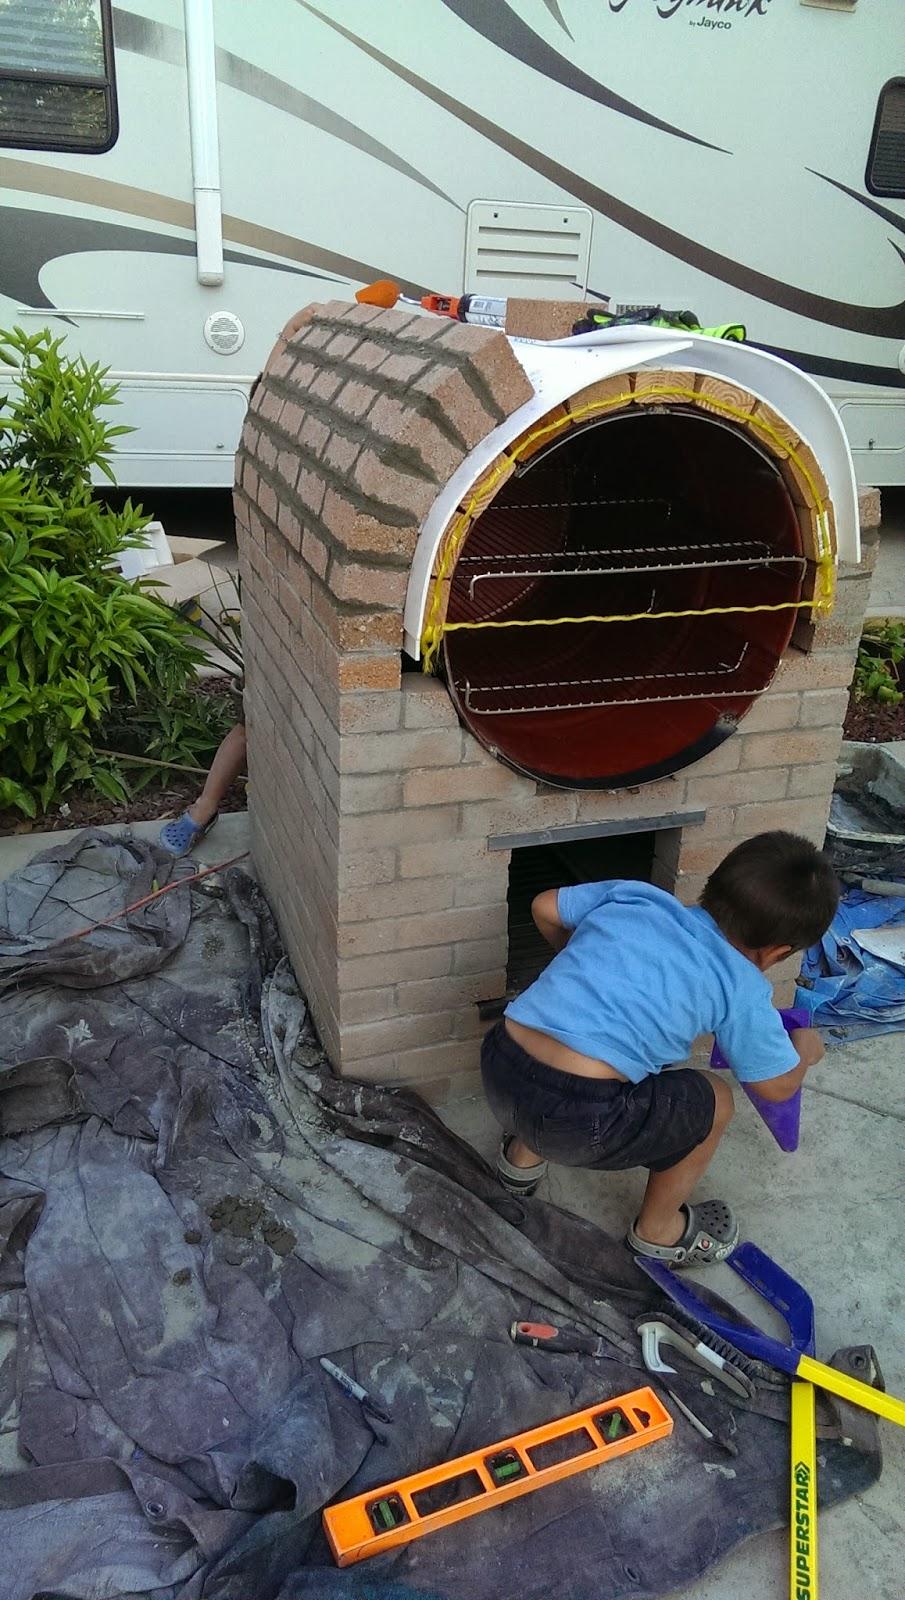 Makermonkey The Pizza Oven